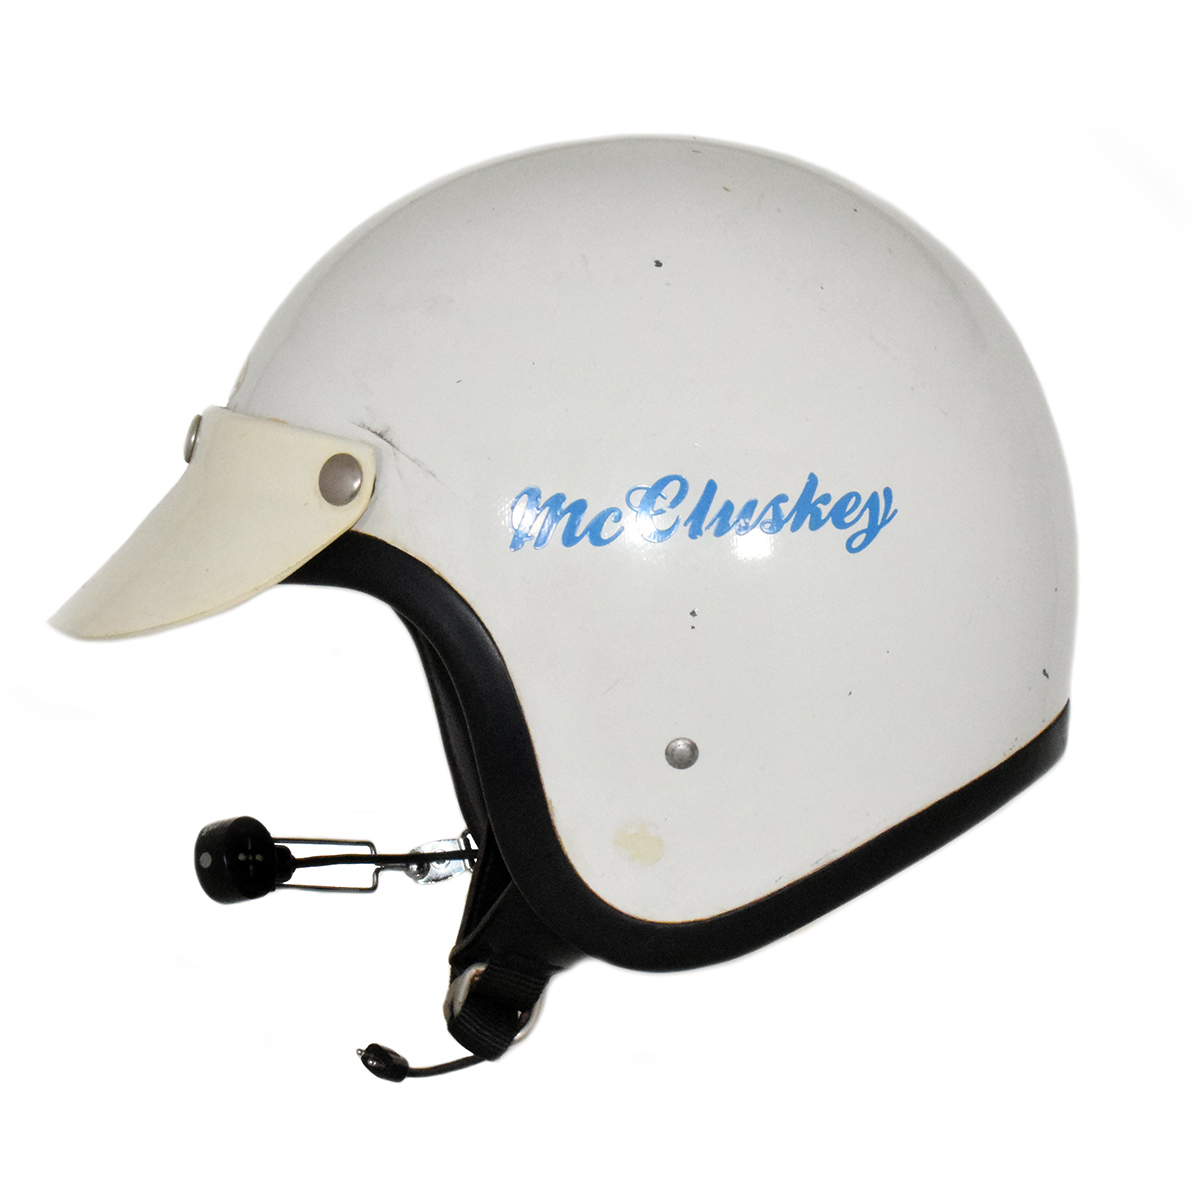 1969 Roger McCluskey USAC Stock Car NASCAR Race Used Helmet